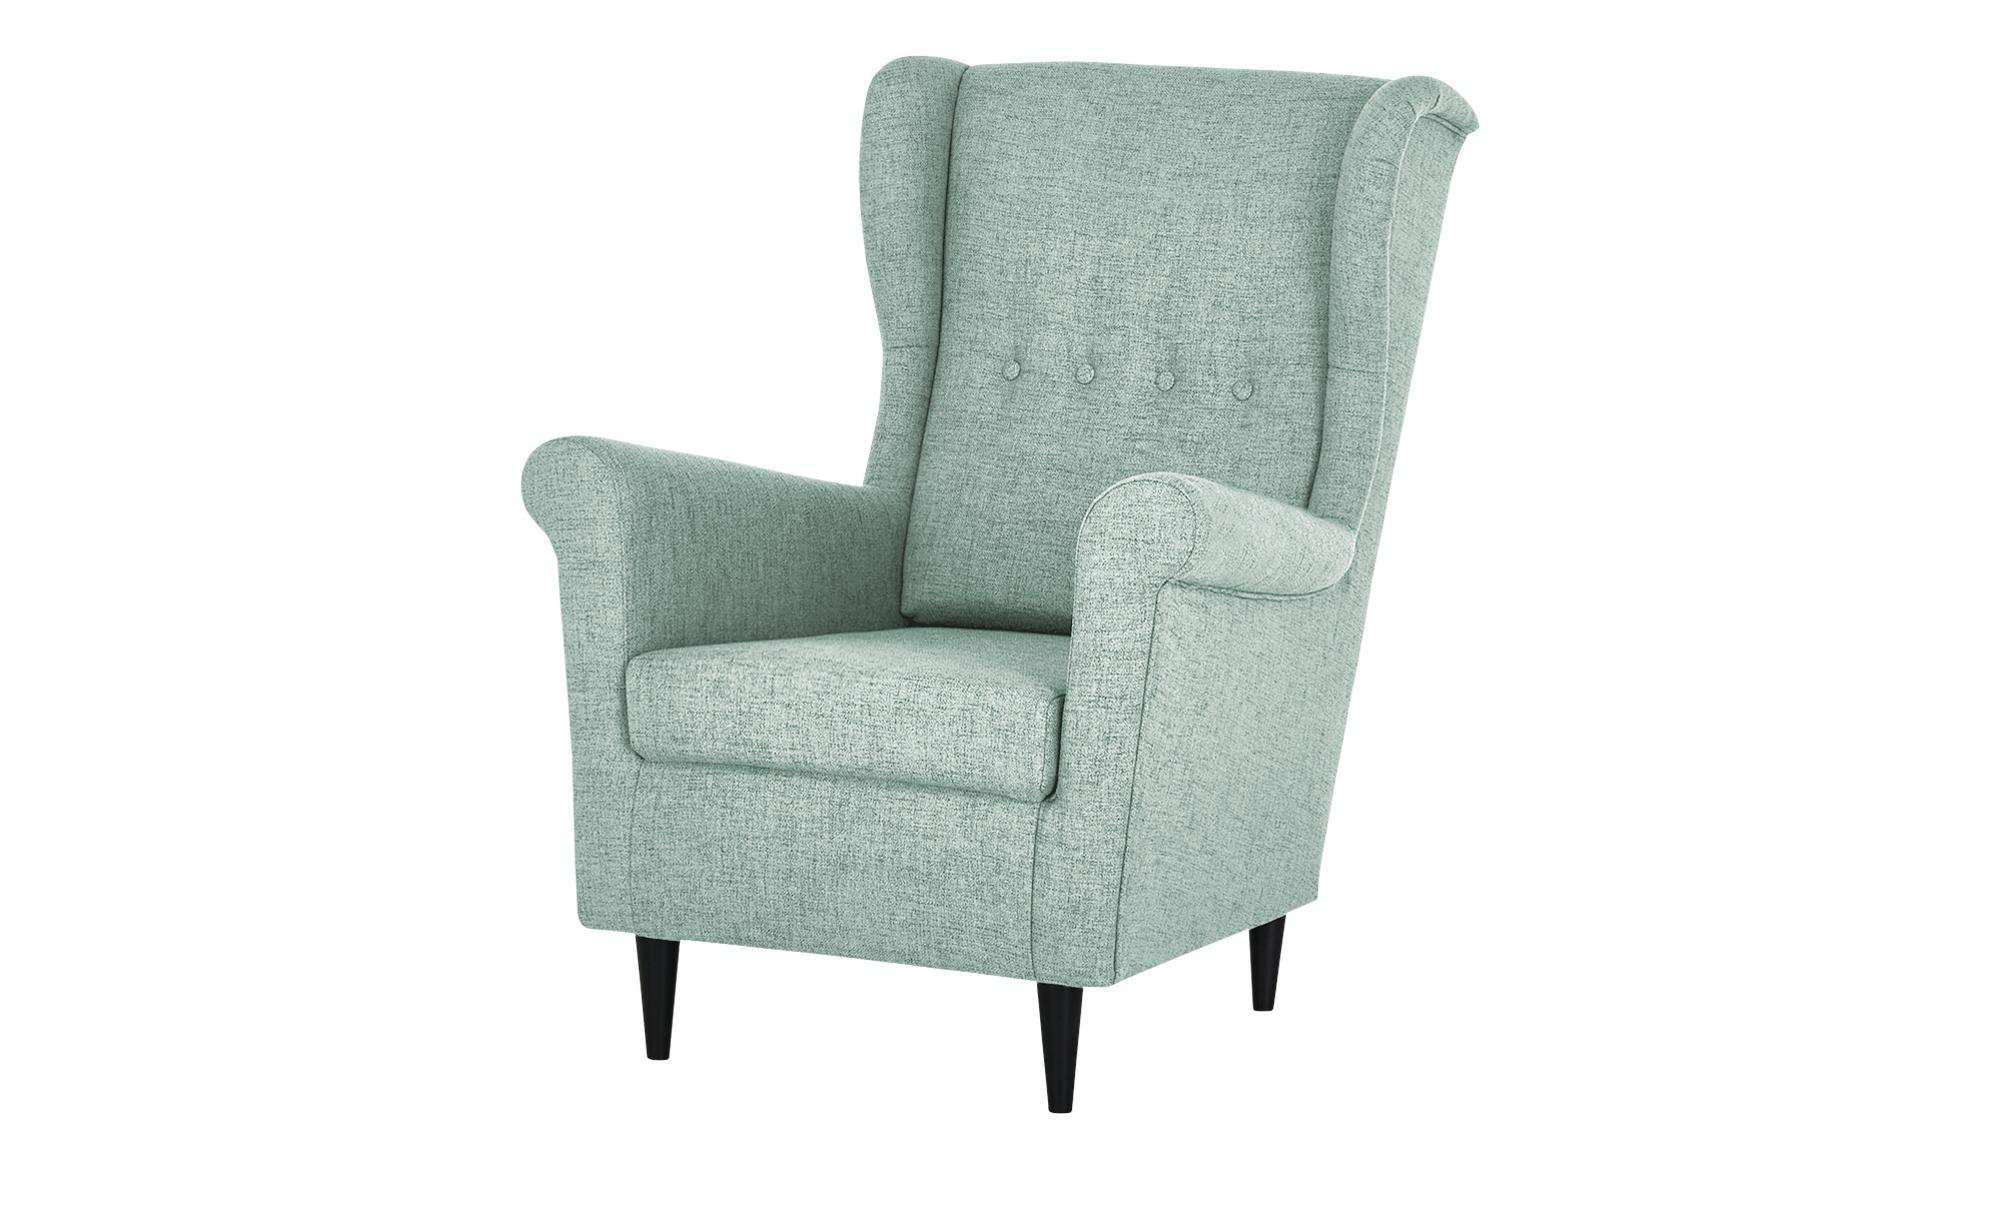 smart Sessel  Hubertine ¦ blau ¦ Maße (cm): B: 82 H: 102 T: 89 Polstermöbel > Sessel > Ohrensessel - Höffner